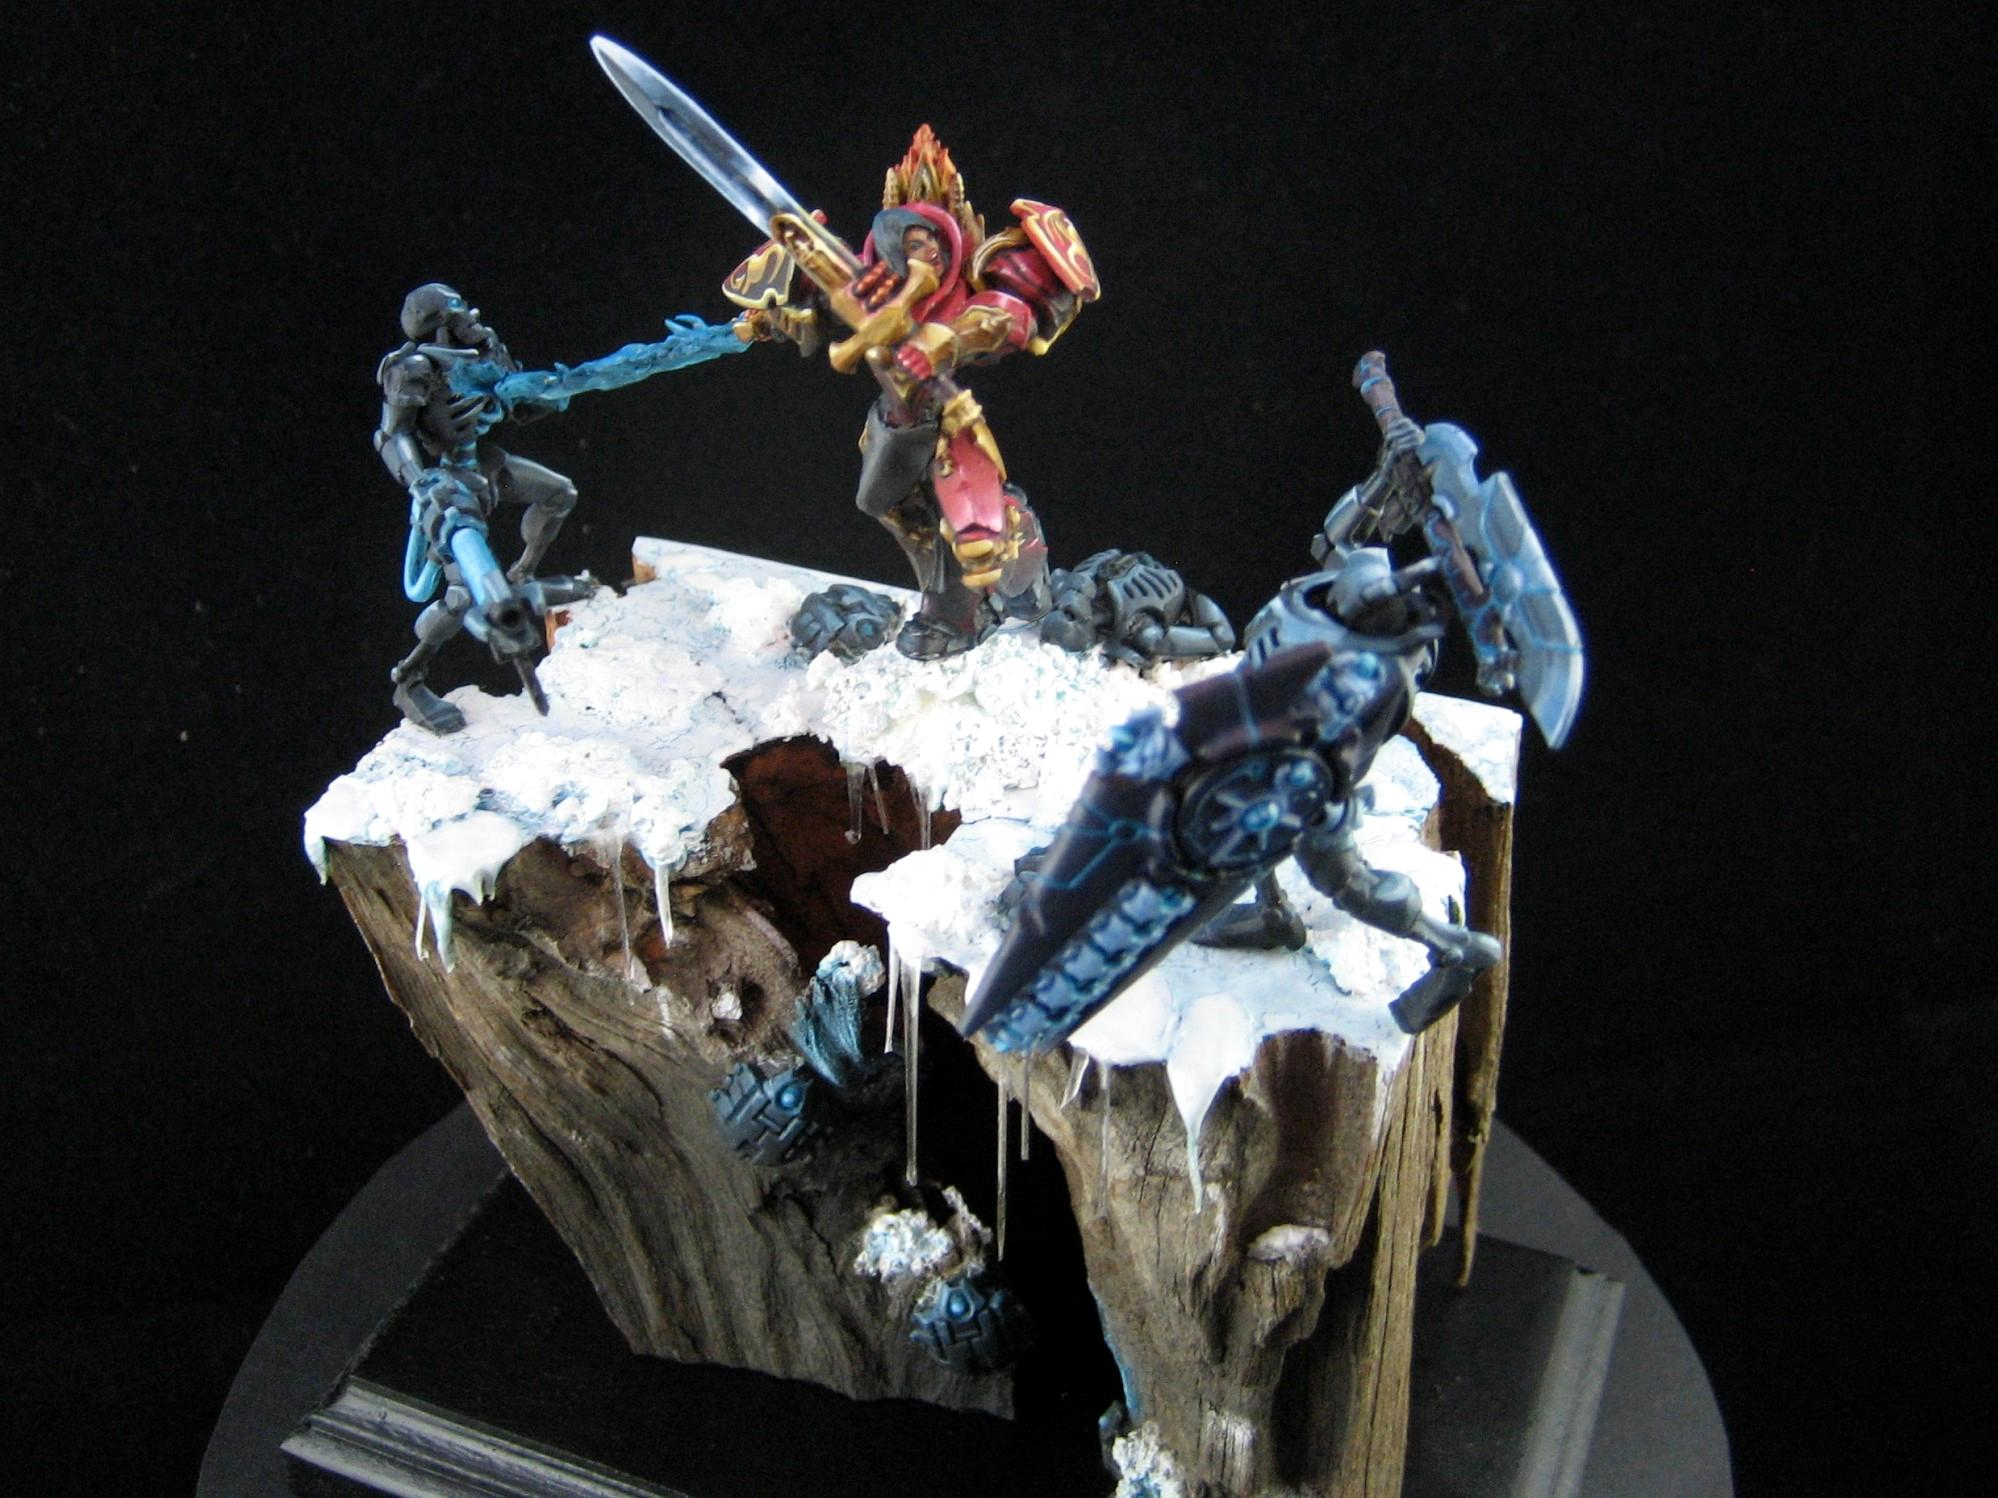 Ice, Necrons, Plinth, Swordswoman, Warriors